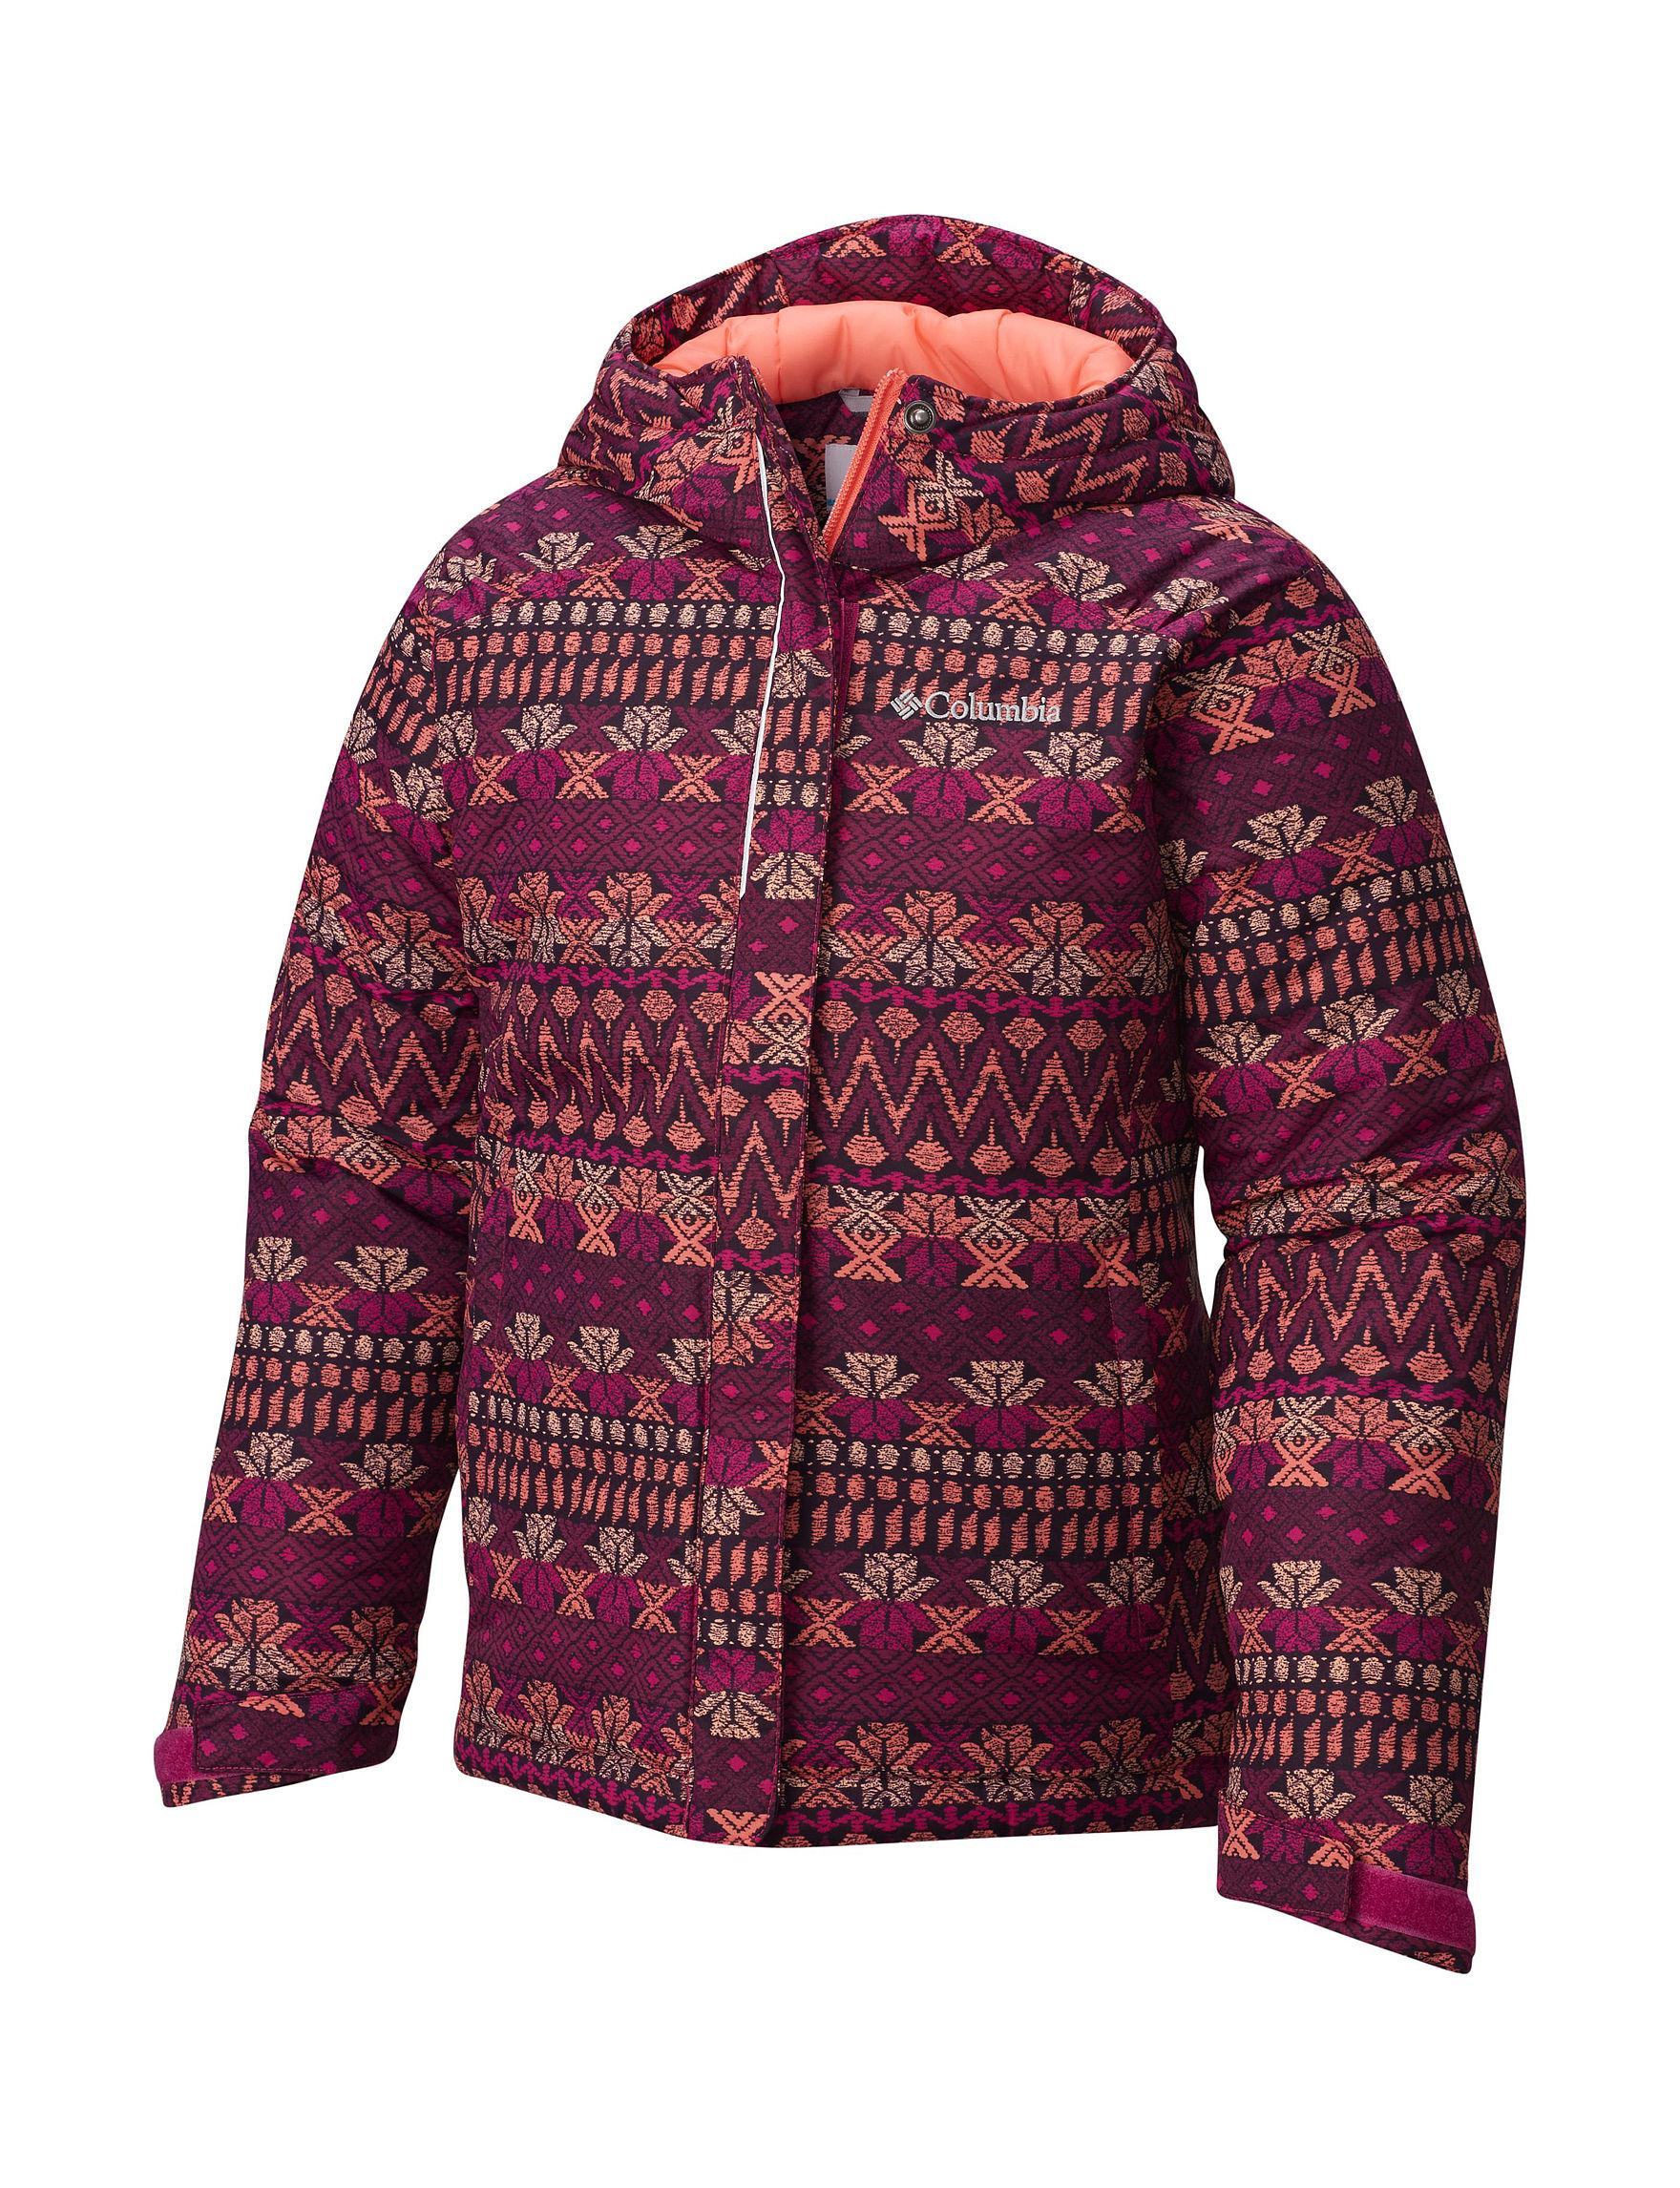 Columbia Purple Multi Fleece & Soft Shell Jackets